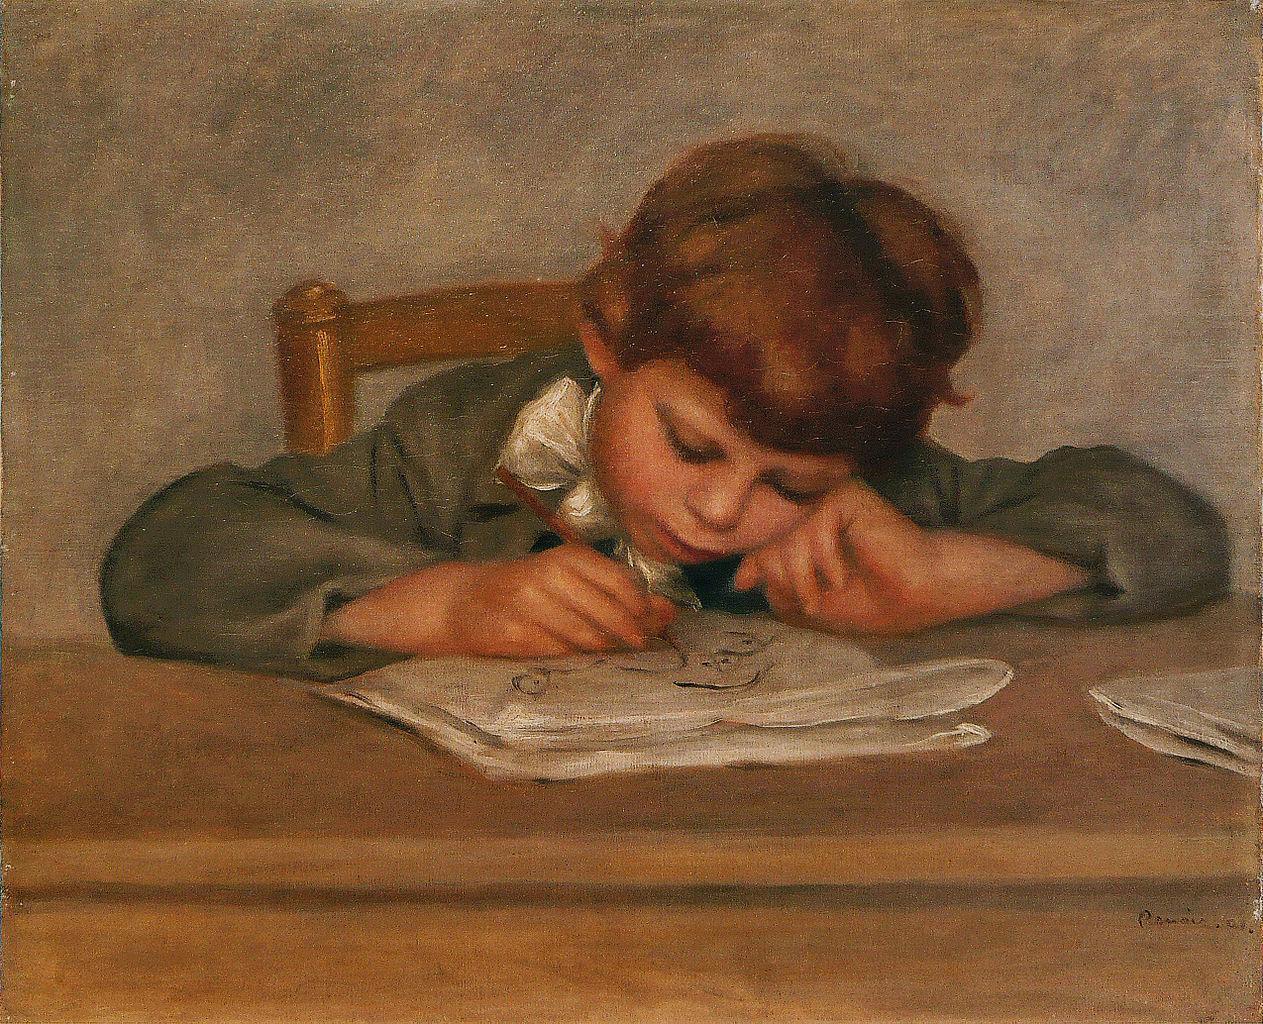 http://upload.wikimedia.org/wikipedia/commons/thumb/f/f3/Pierre-Auguste_Renoir_-_Jean_Renoir_dessinant.jpg/1263px-Pierre-Auguste_Renoir_-_Jean_Renoir_dessinant.jpg